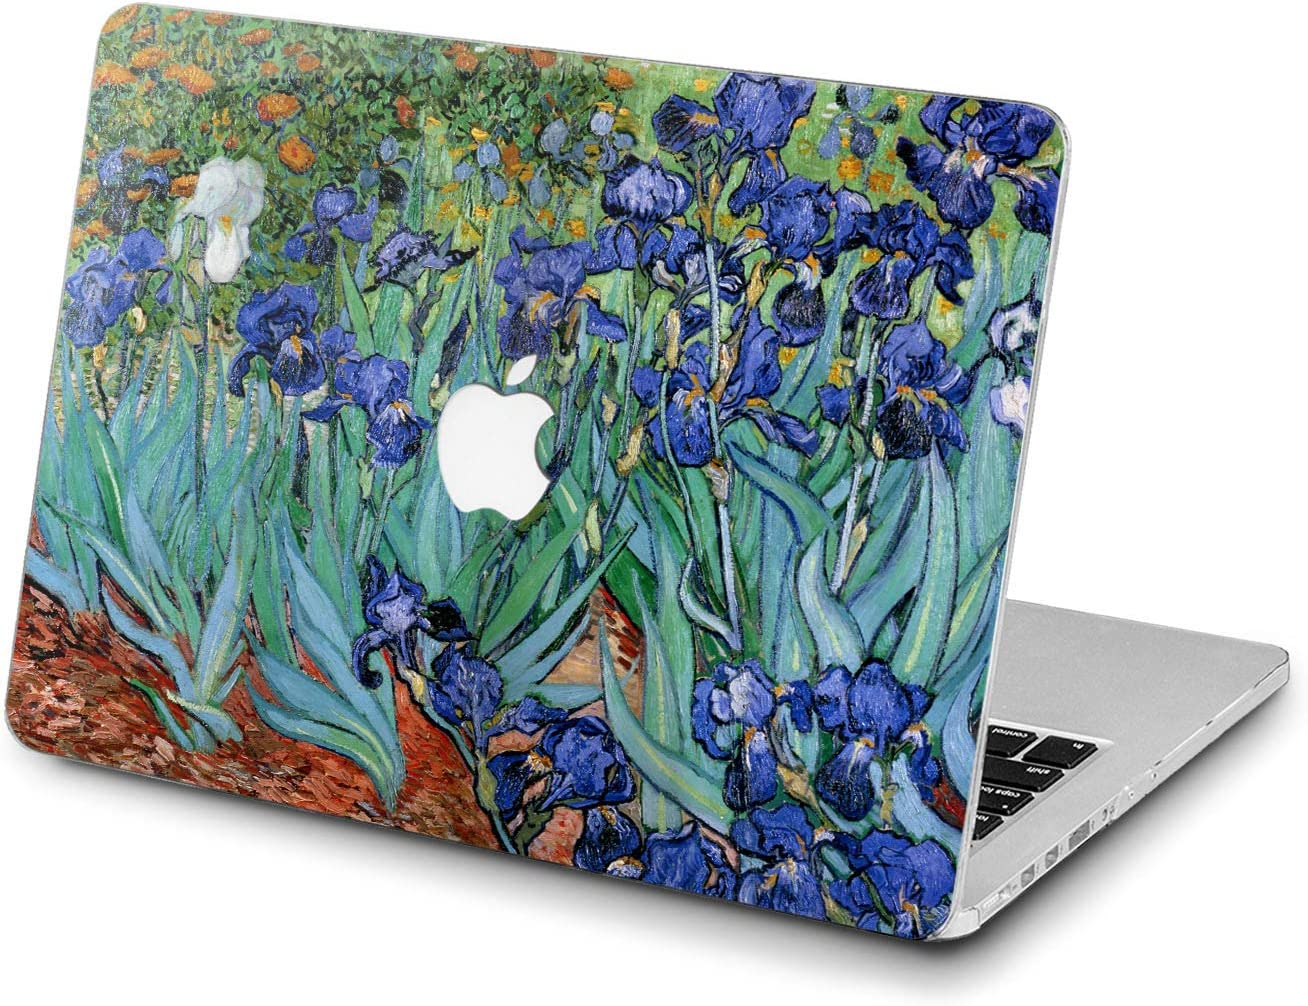 Lex Altern Hard Case for Apple MacBook Pro 15 Air 13 inch Mac Retina 12 11 2020 2019 2018 2017 2016 Blue Artwork Laptop Artistic Van Gogh Plastic Painting Cover Girl Women Irises Shell Touch Bar